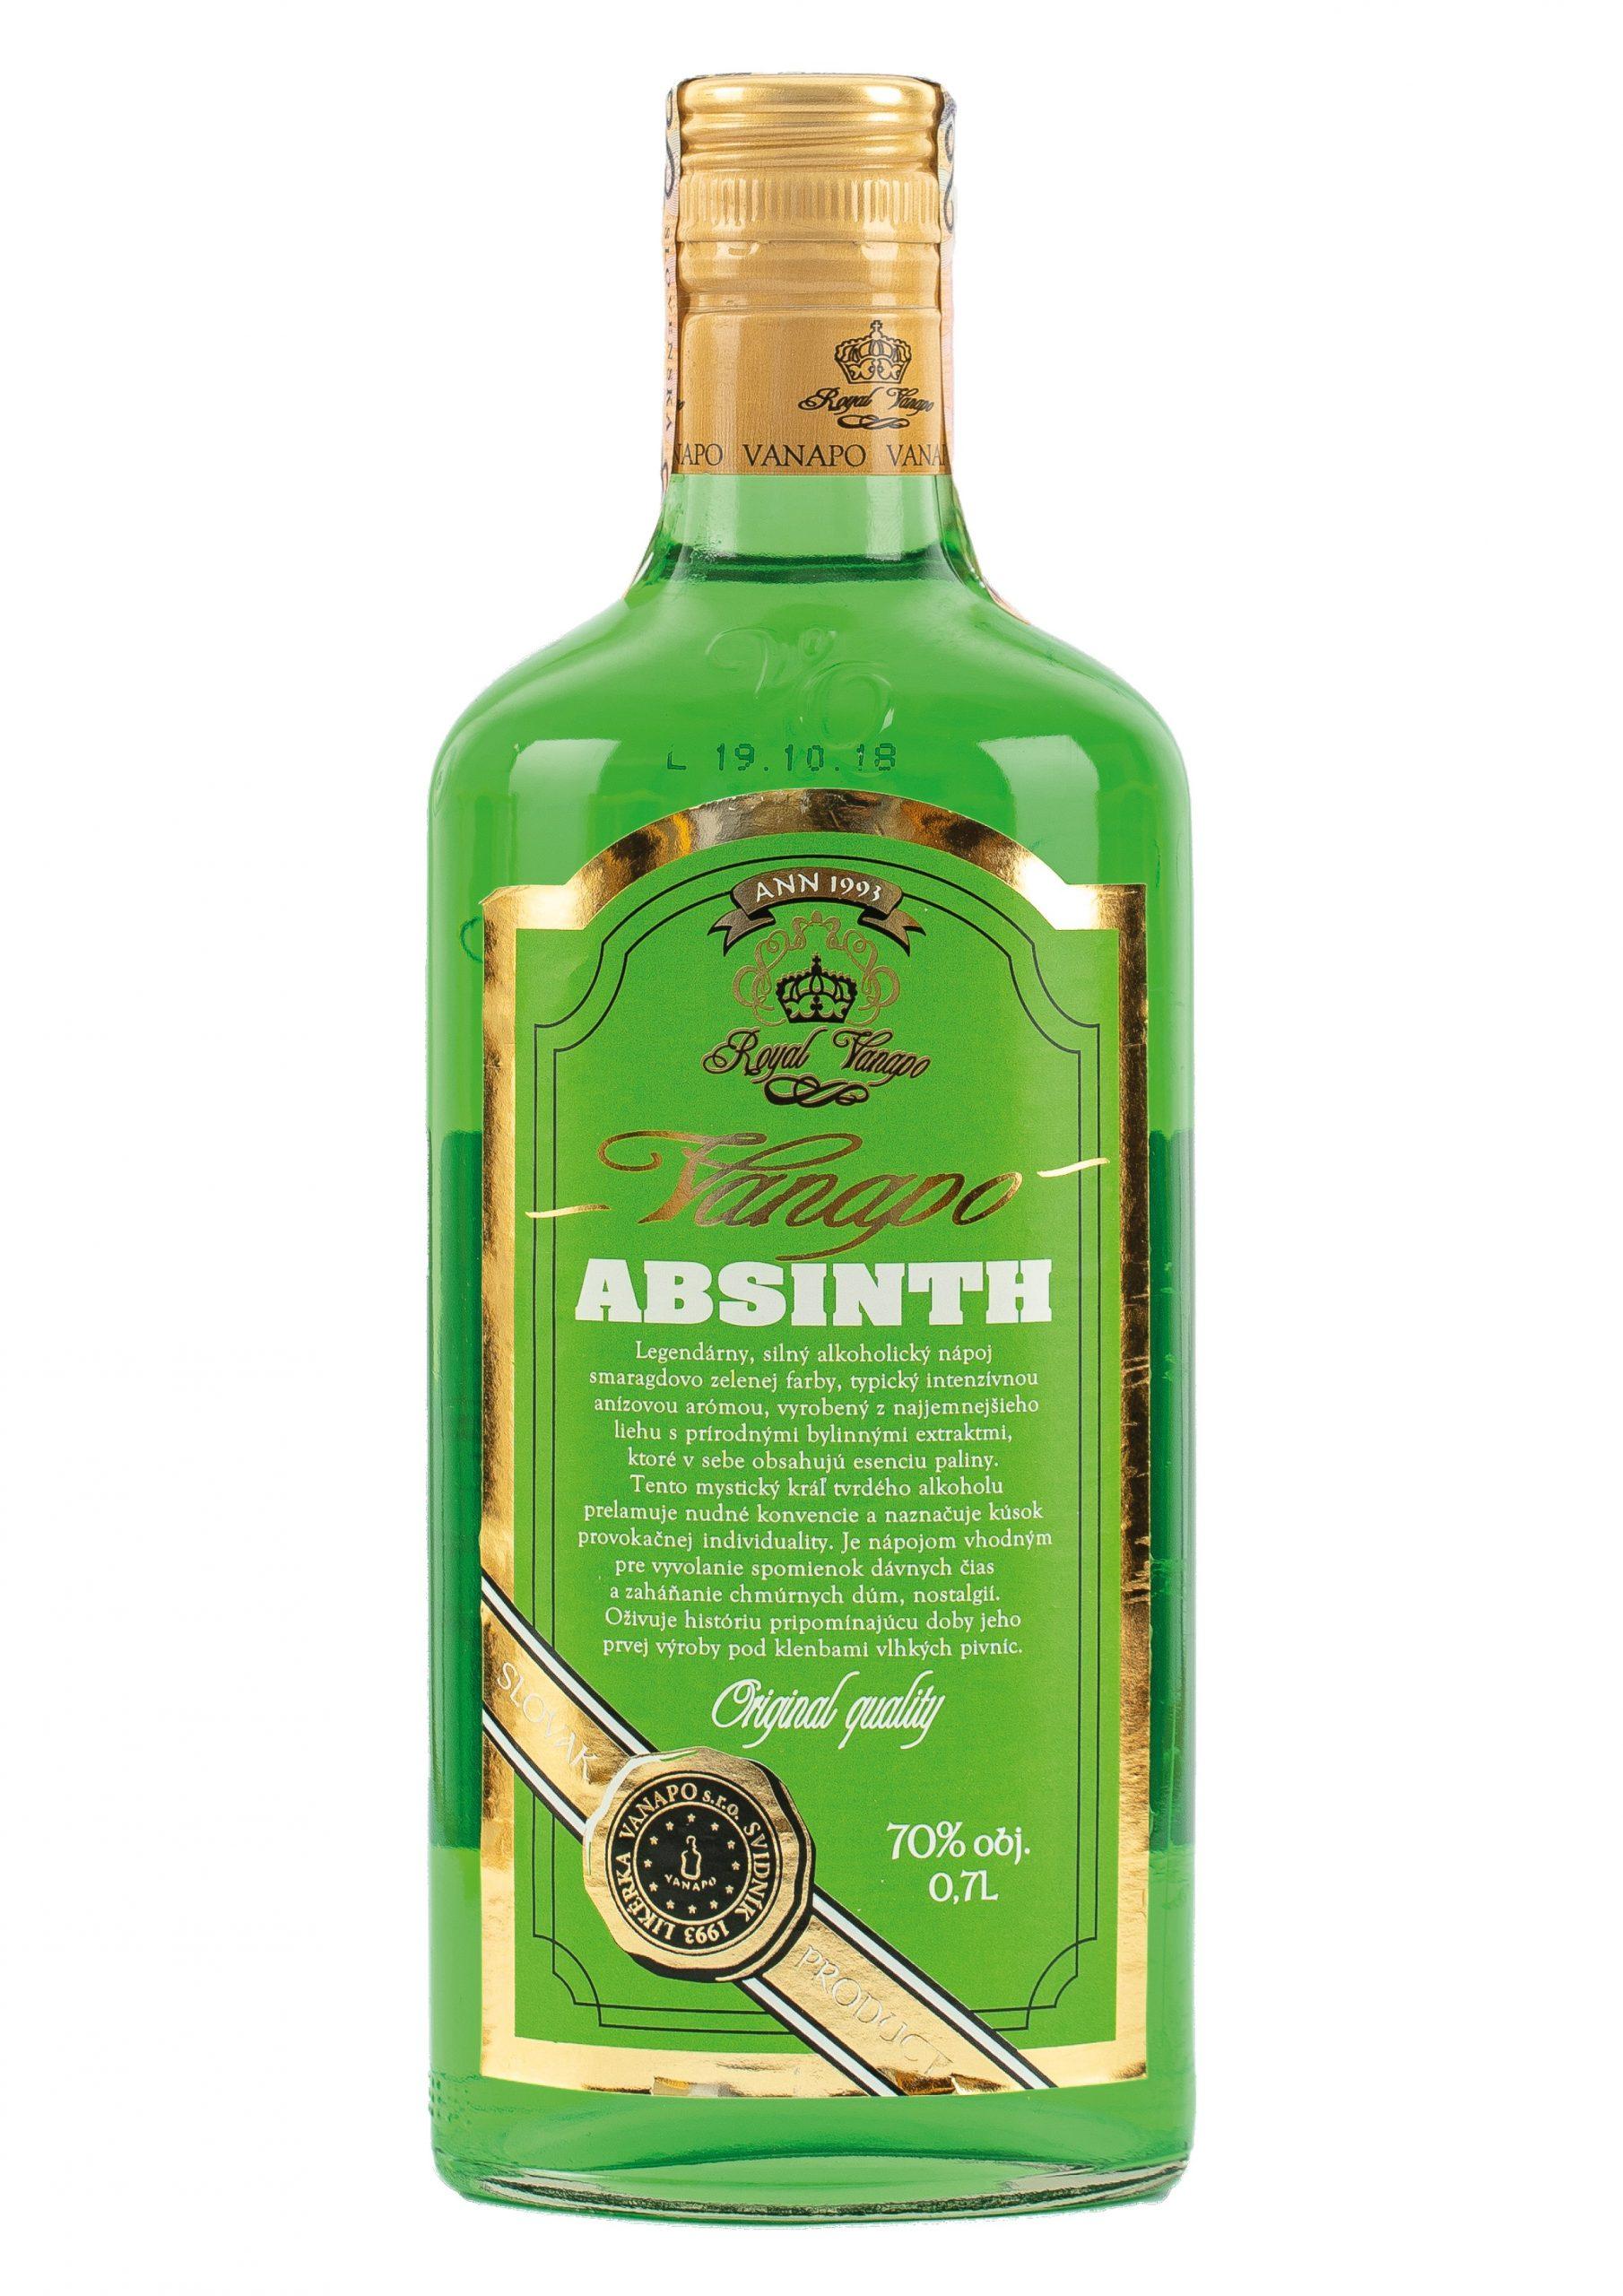 Absint Royal 70 07L scaled 1 - Vanapo Absinth Royal